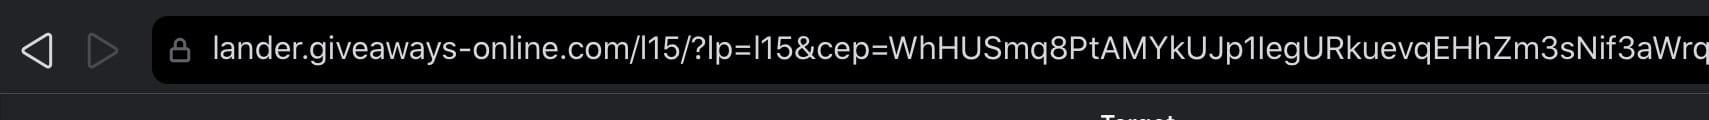 A dodgy URL on a JB HiFi SMS scam